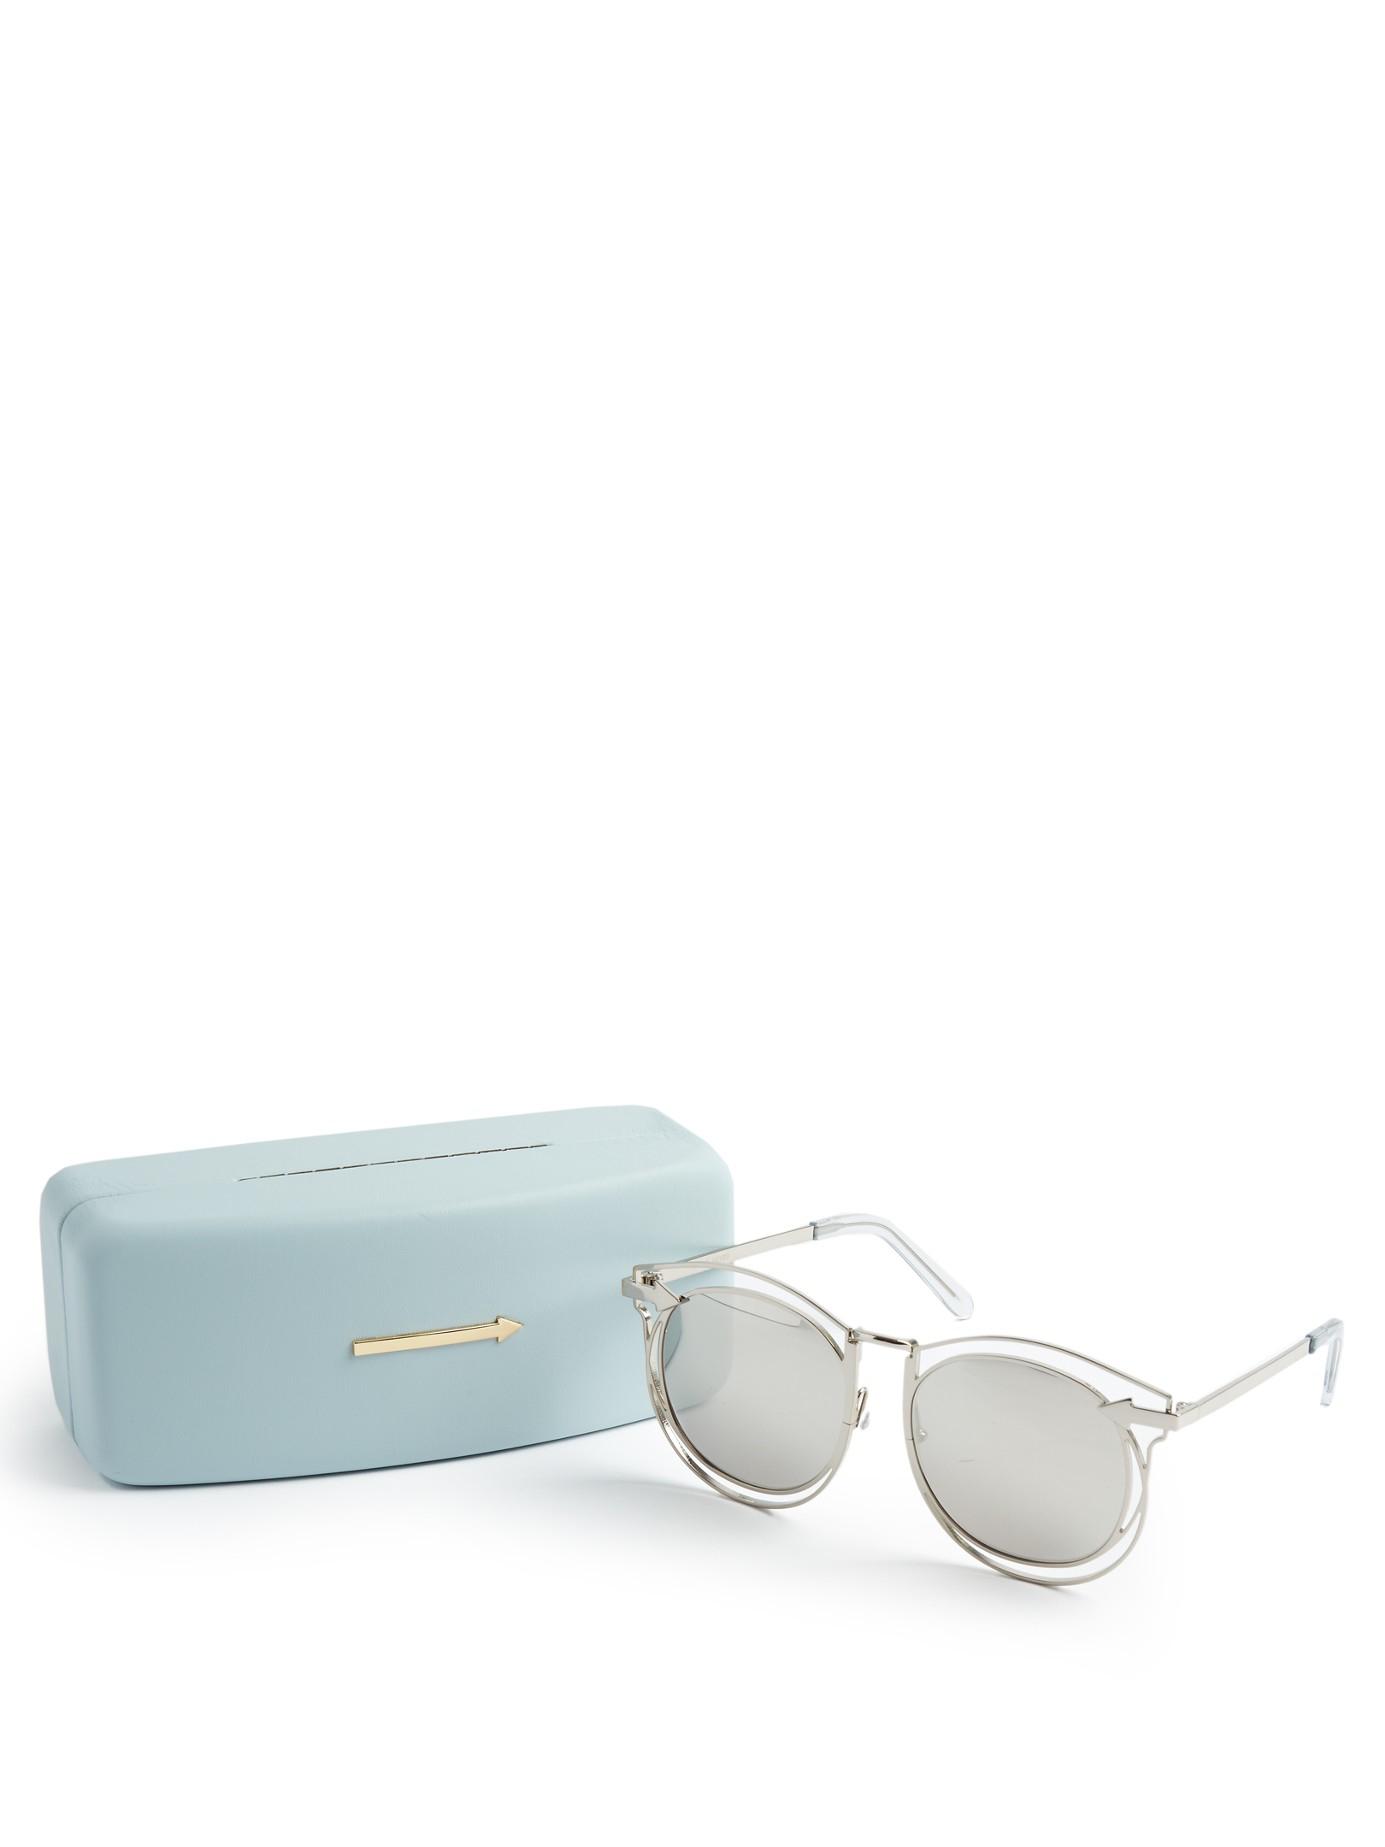 Karen Walker Simone Round-frame Sunglasses in Silver (Metallic)